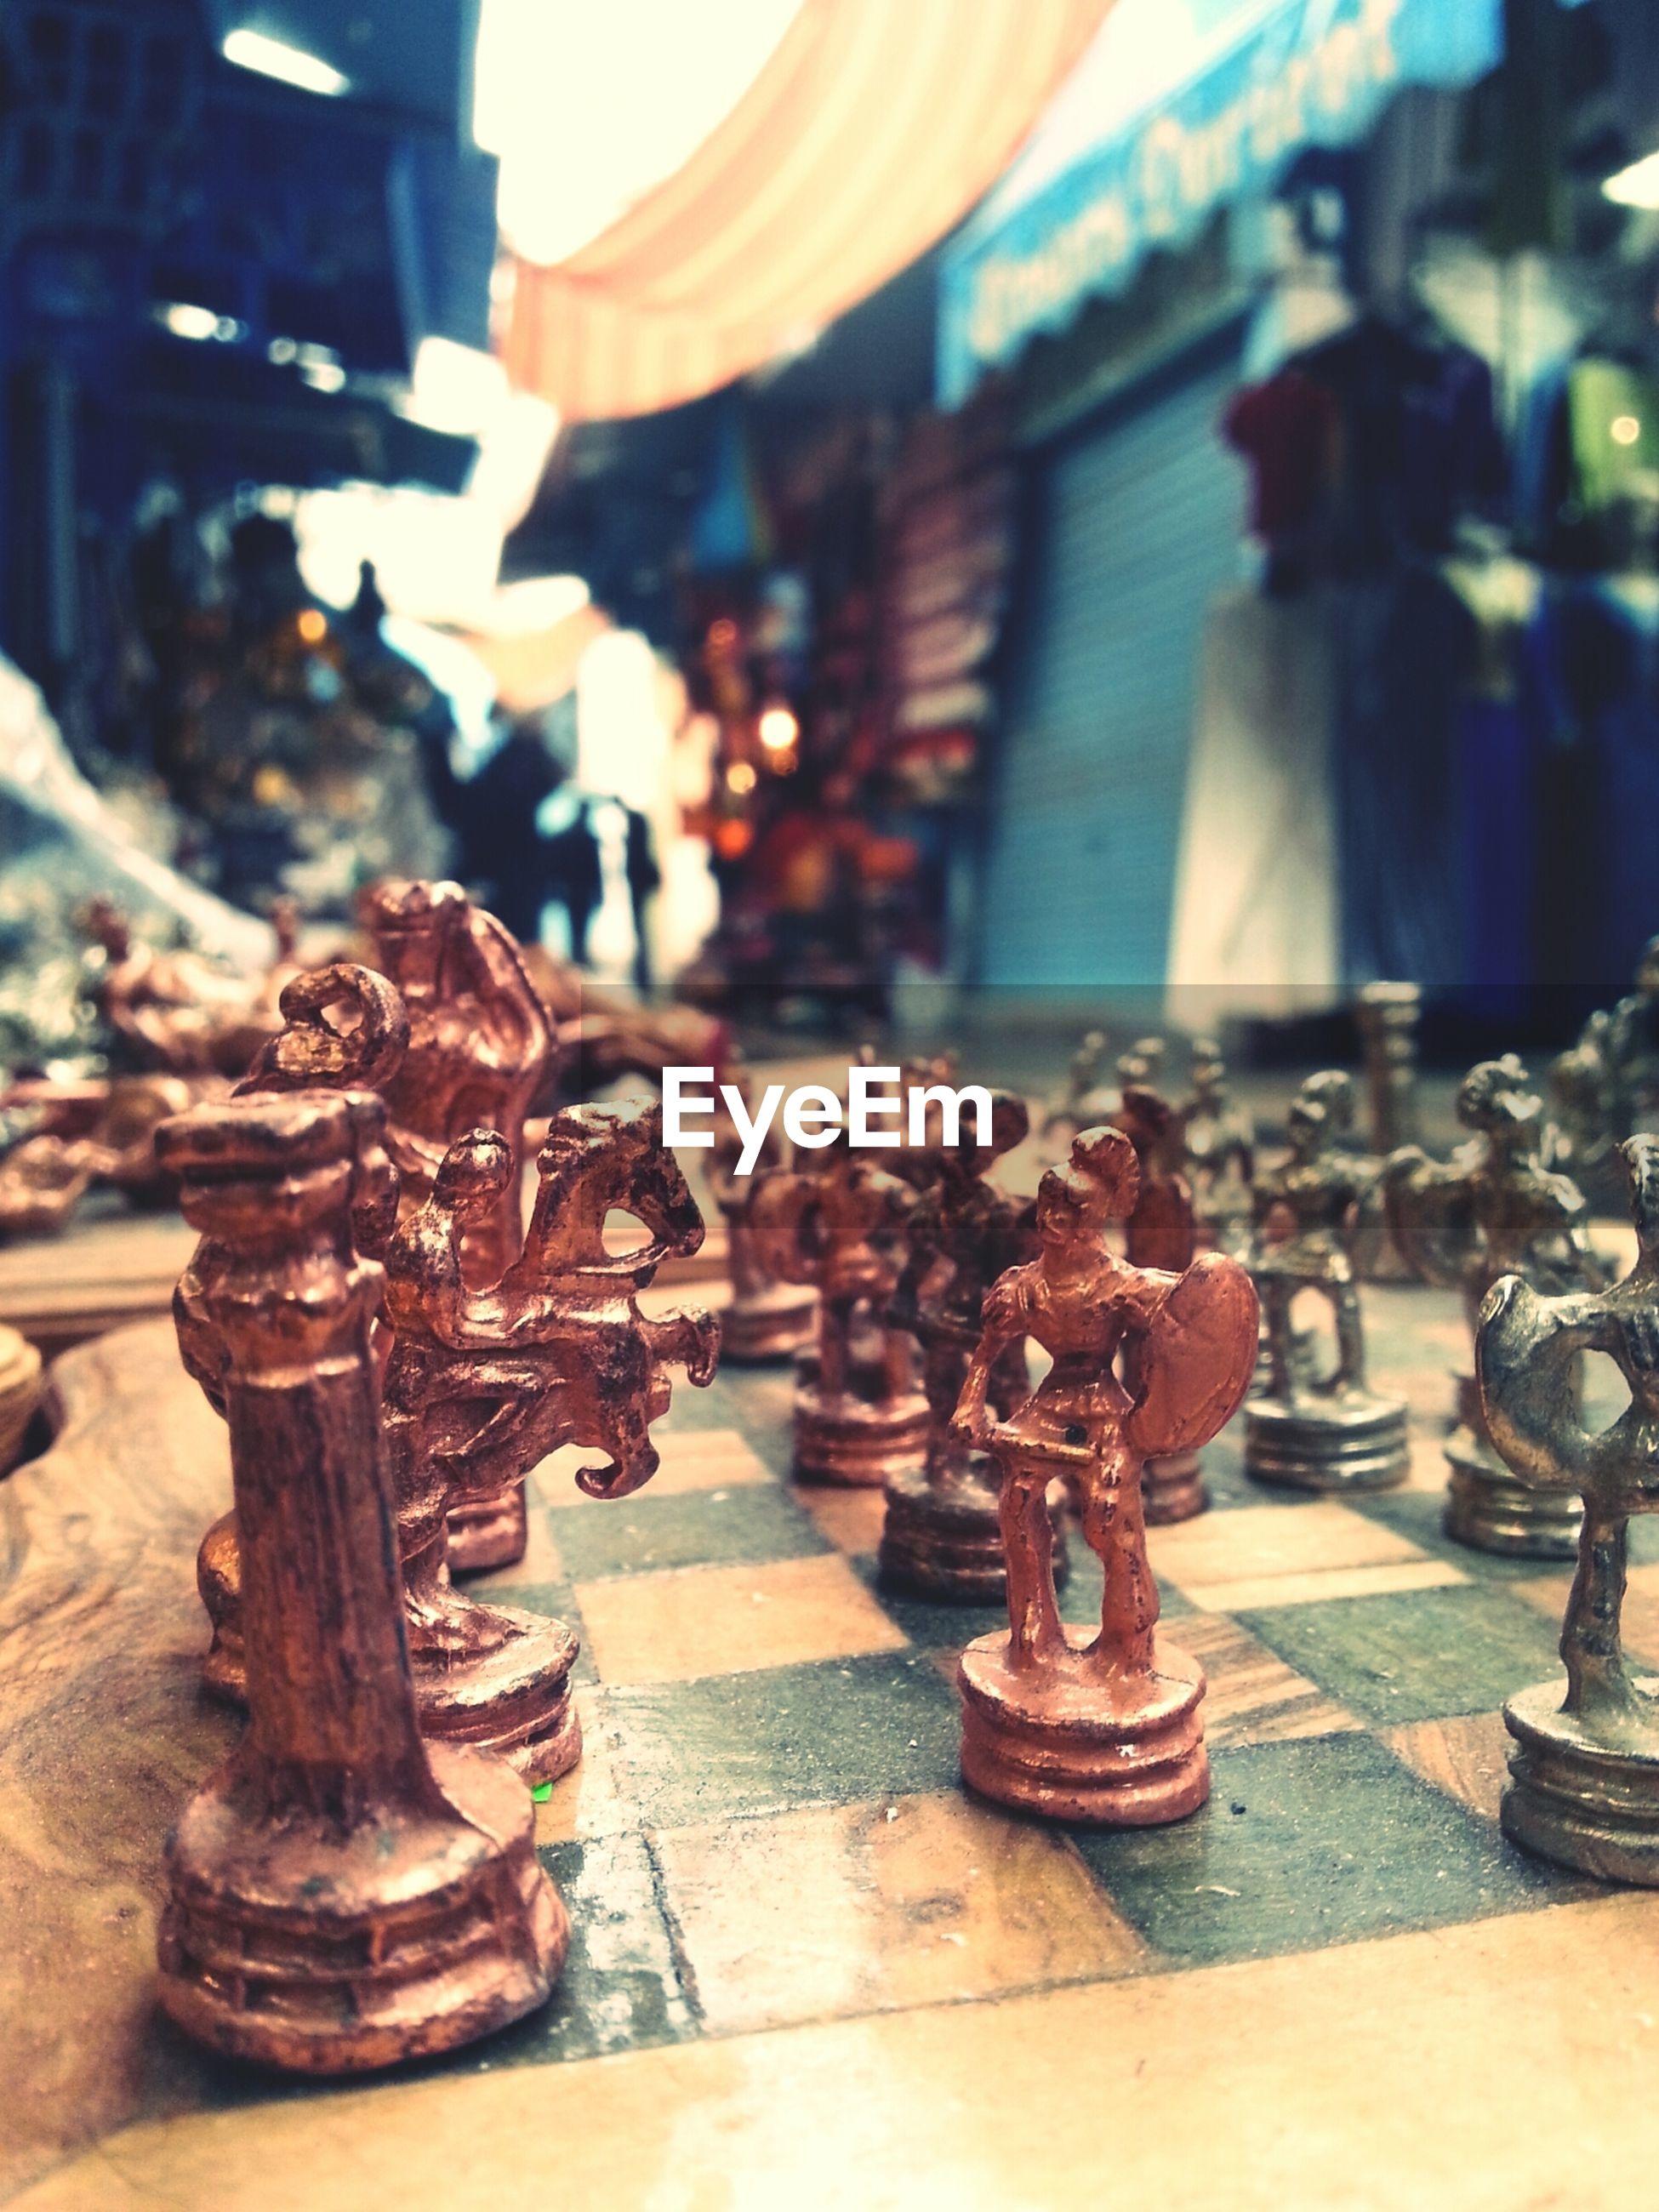 Metallic figurines on chessboard